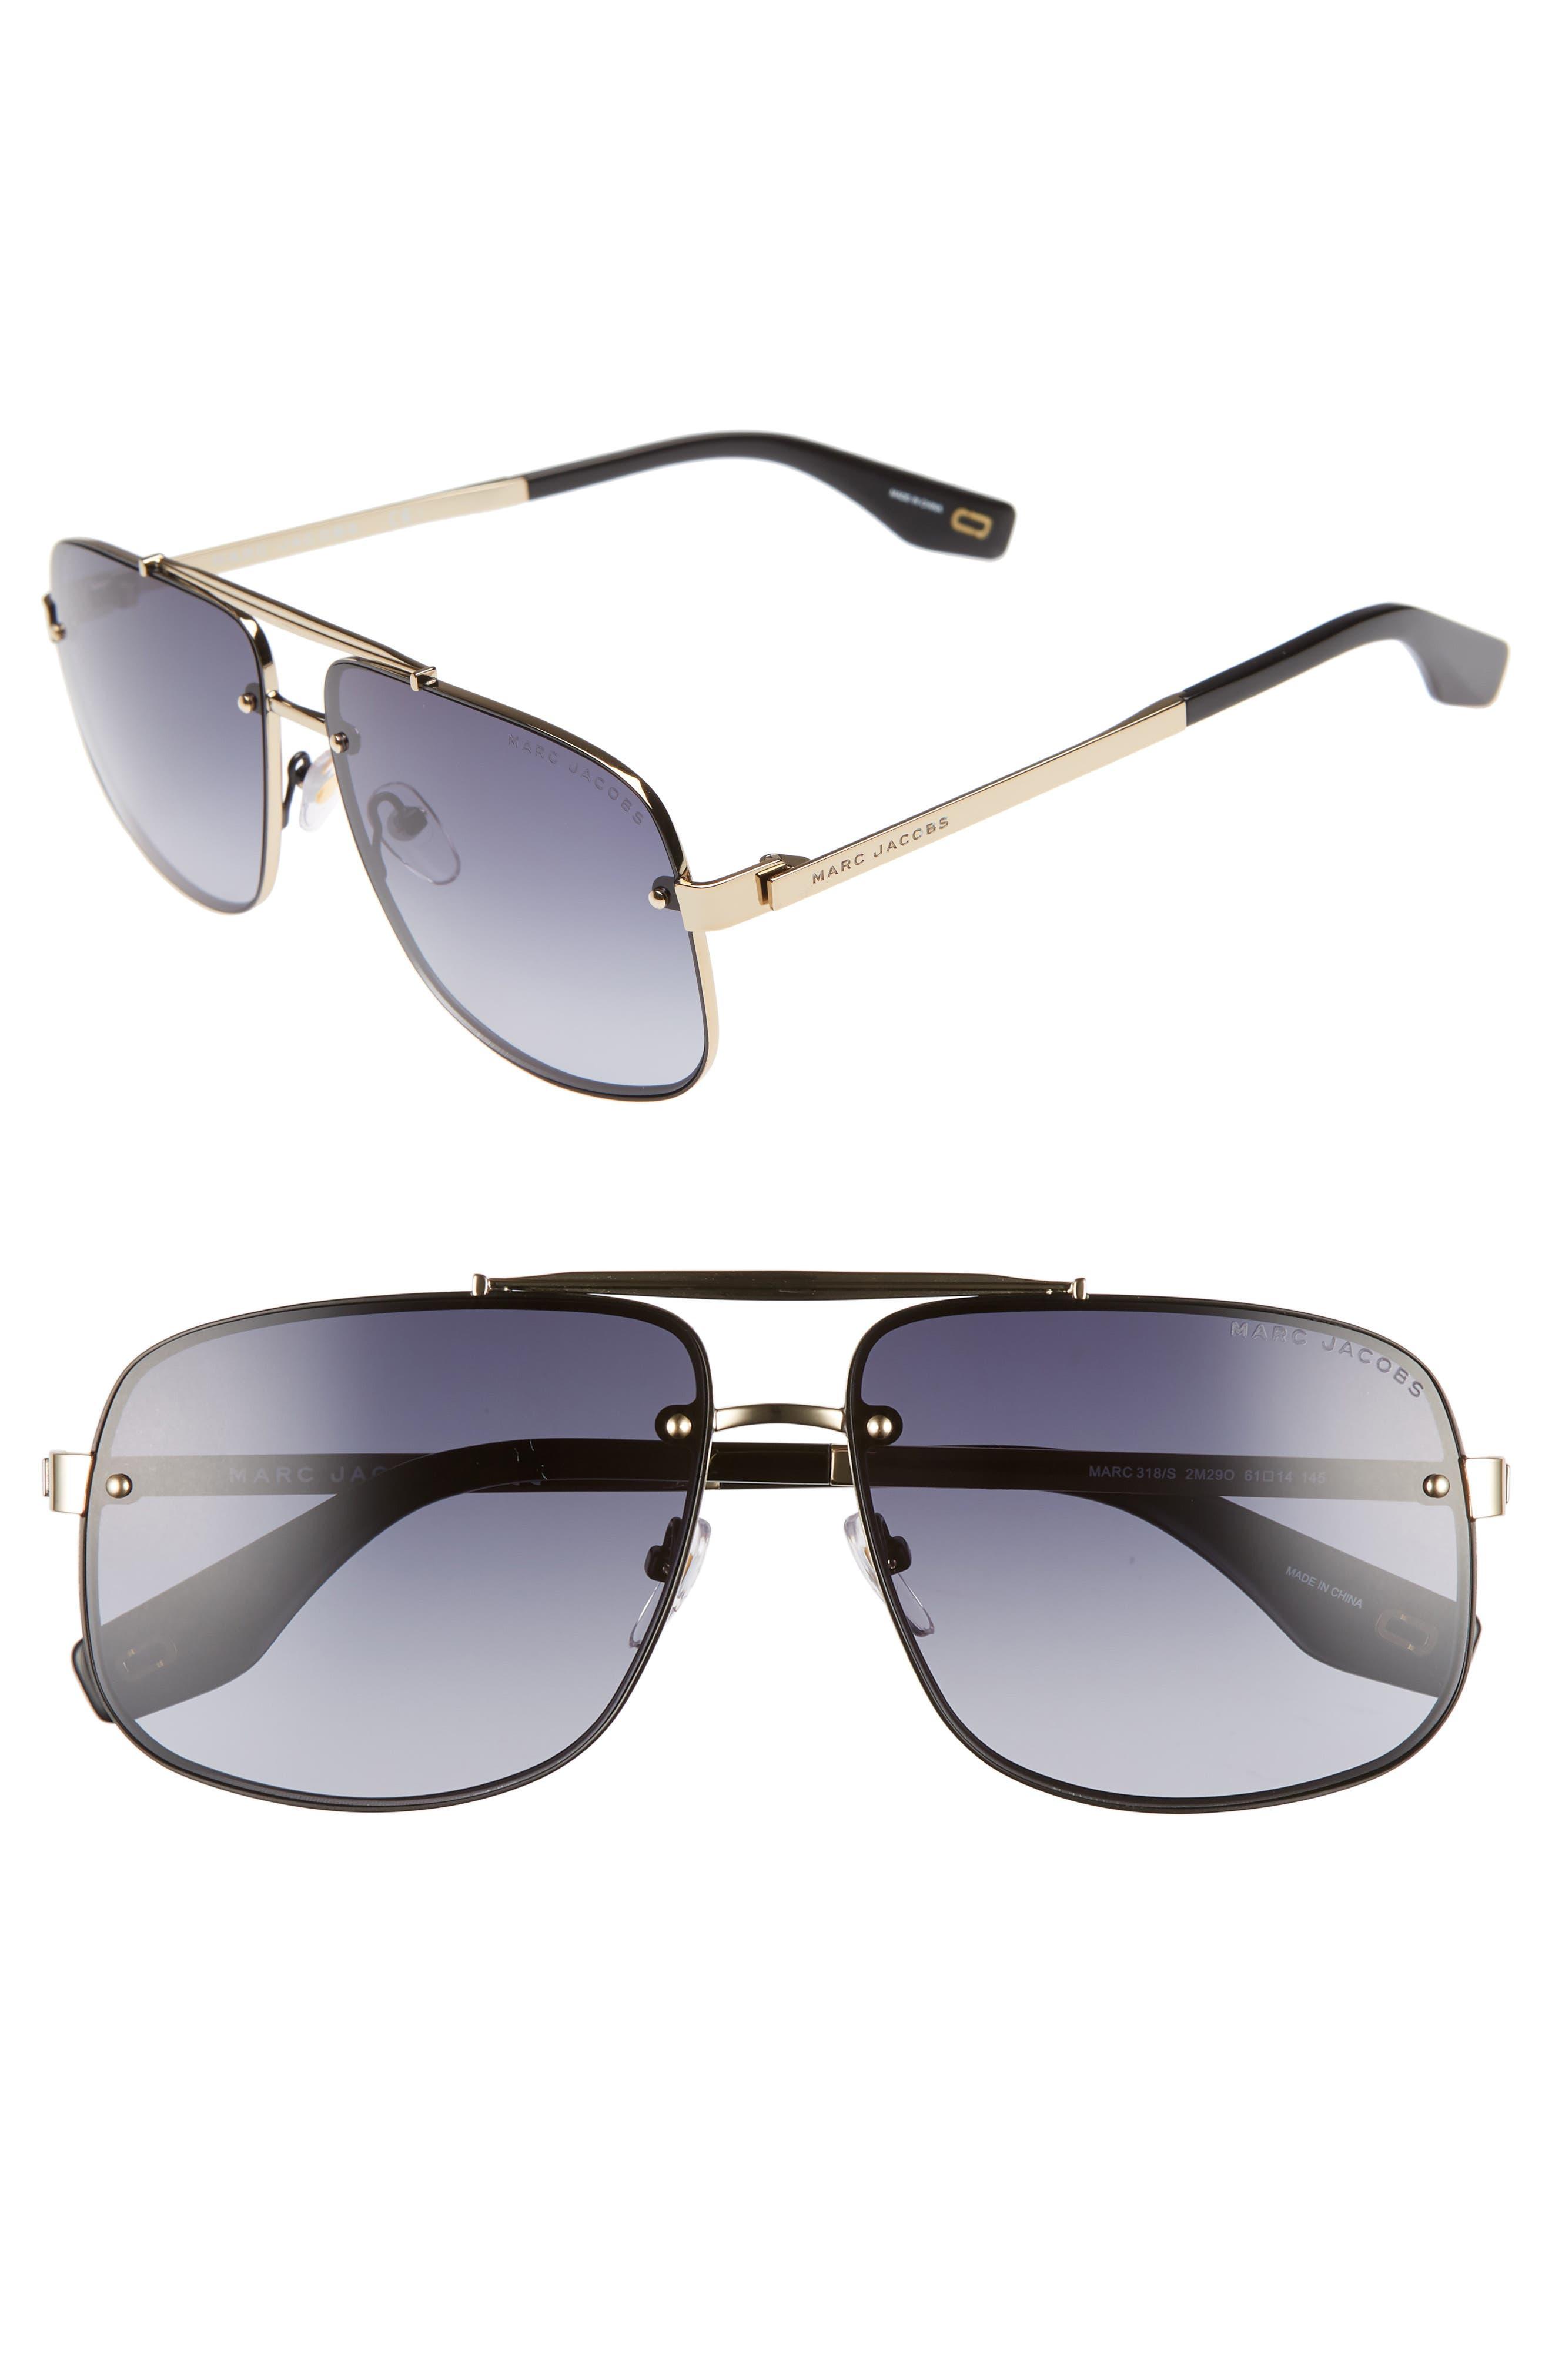 61mm Navigator Sunglasses,                             Main thumbnail 1, color,                             BLACK/ GOLD